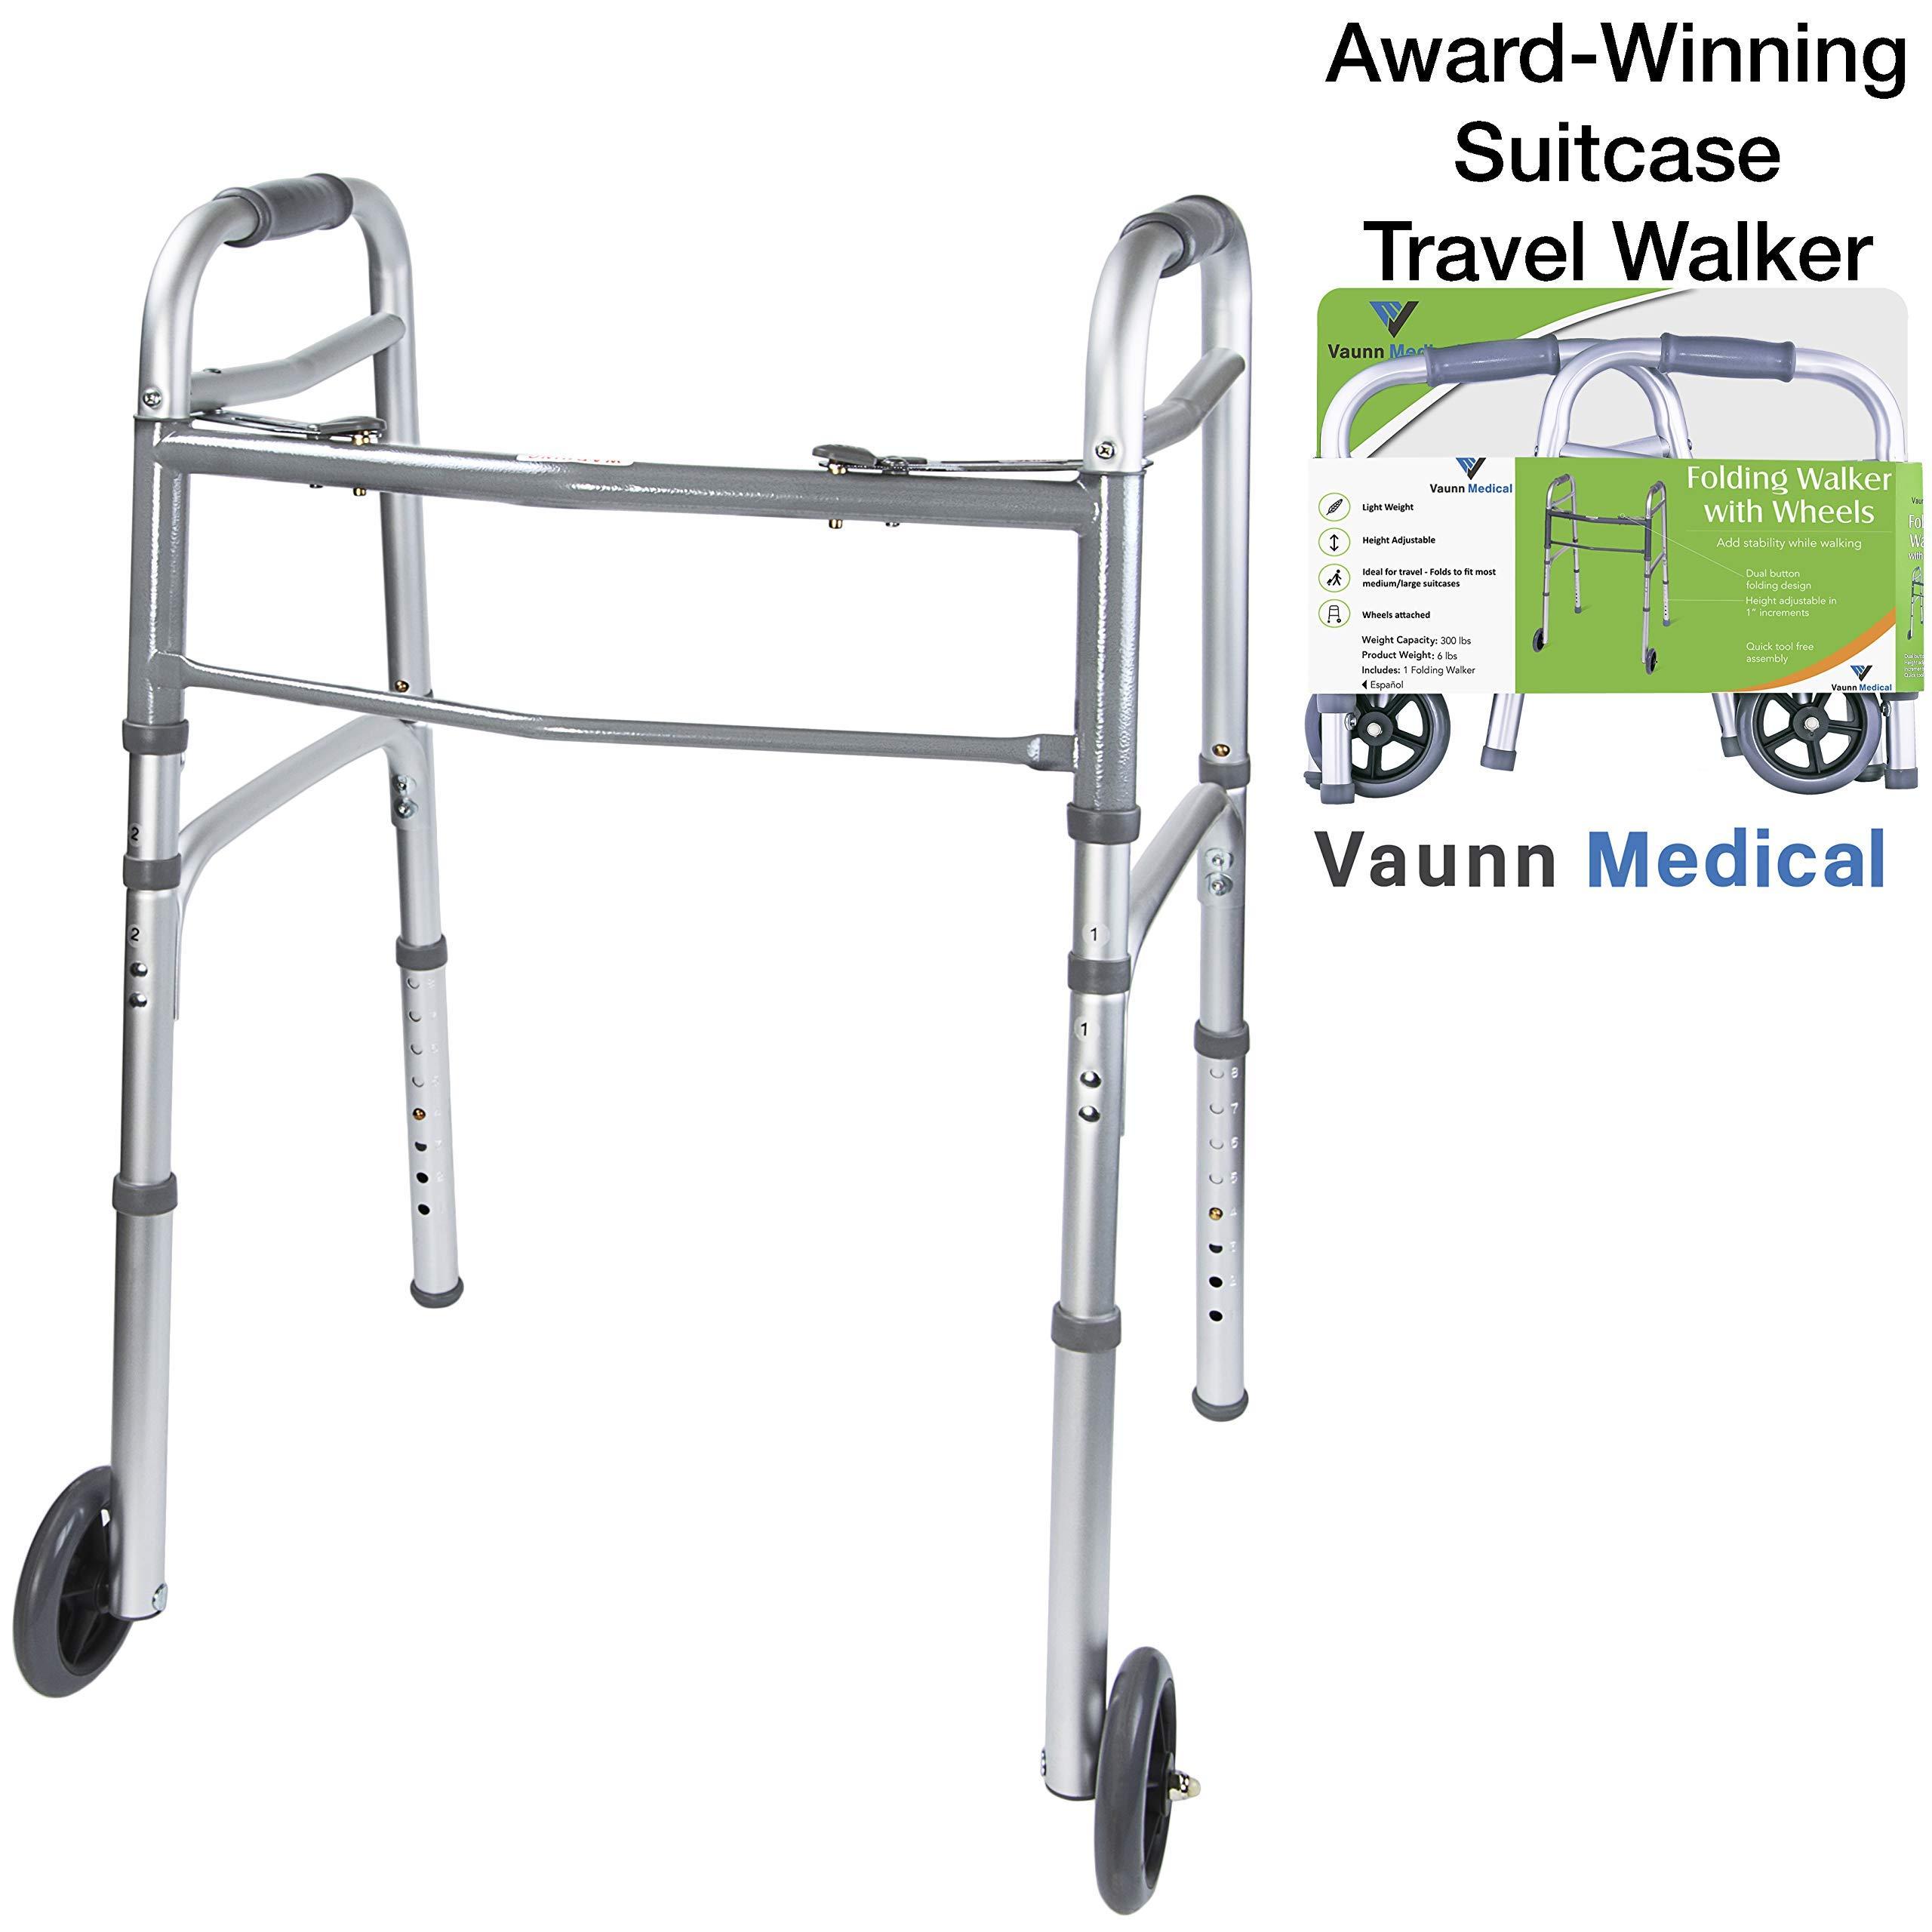 Vaunn Medical Two Button Folding Walker with Wheels, Adjustable Height and Detachable Legs (Renewed) by Vaunn